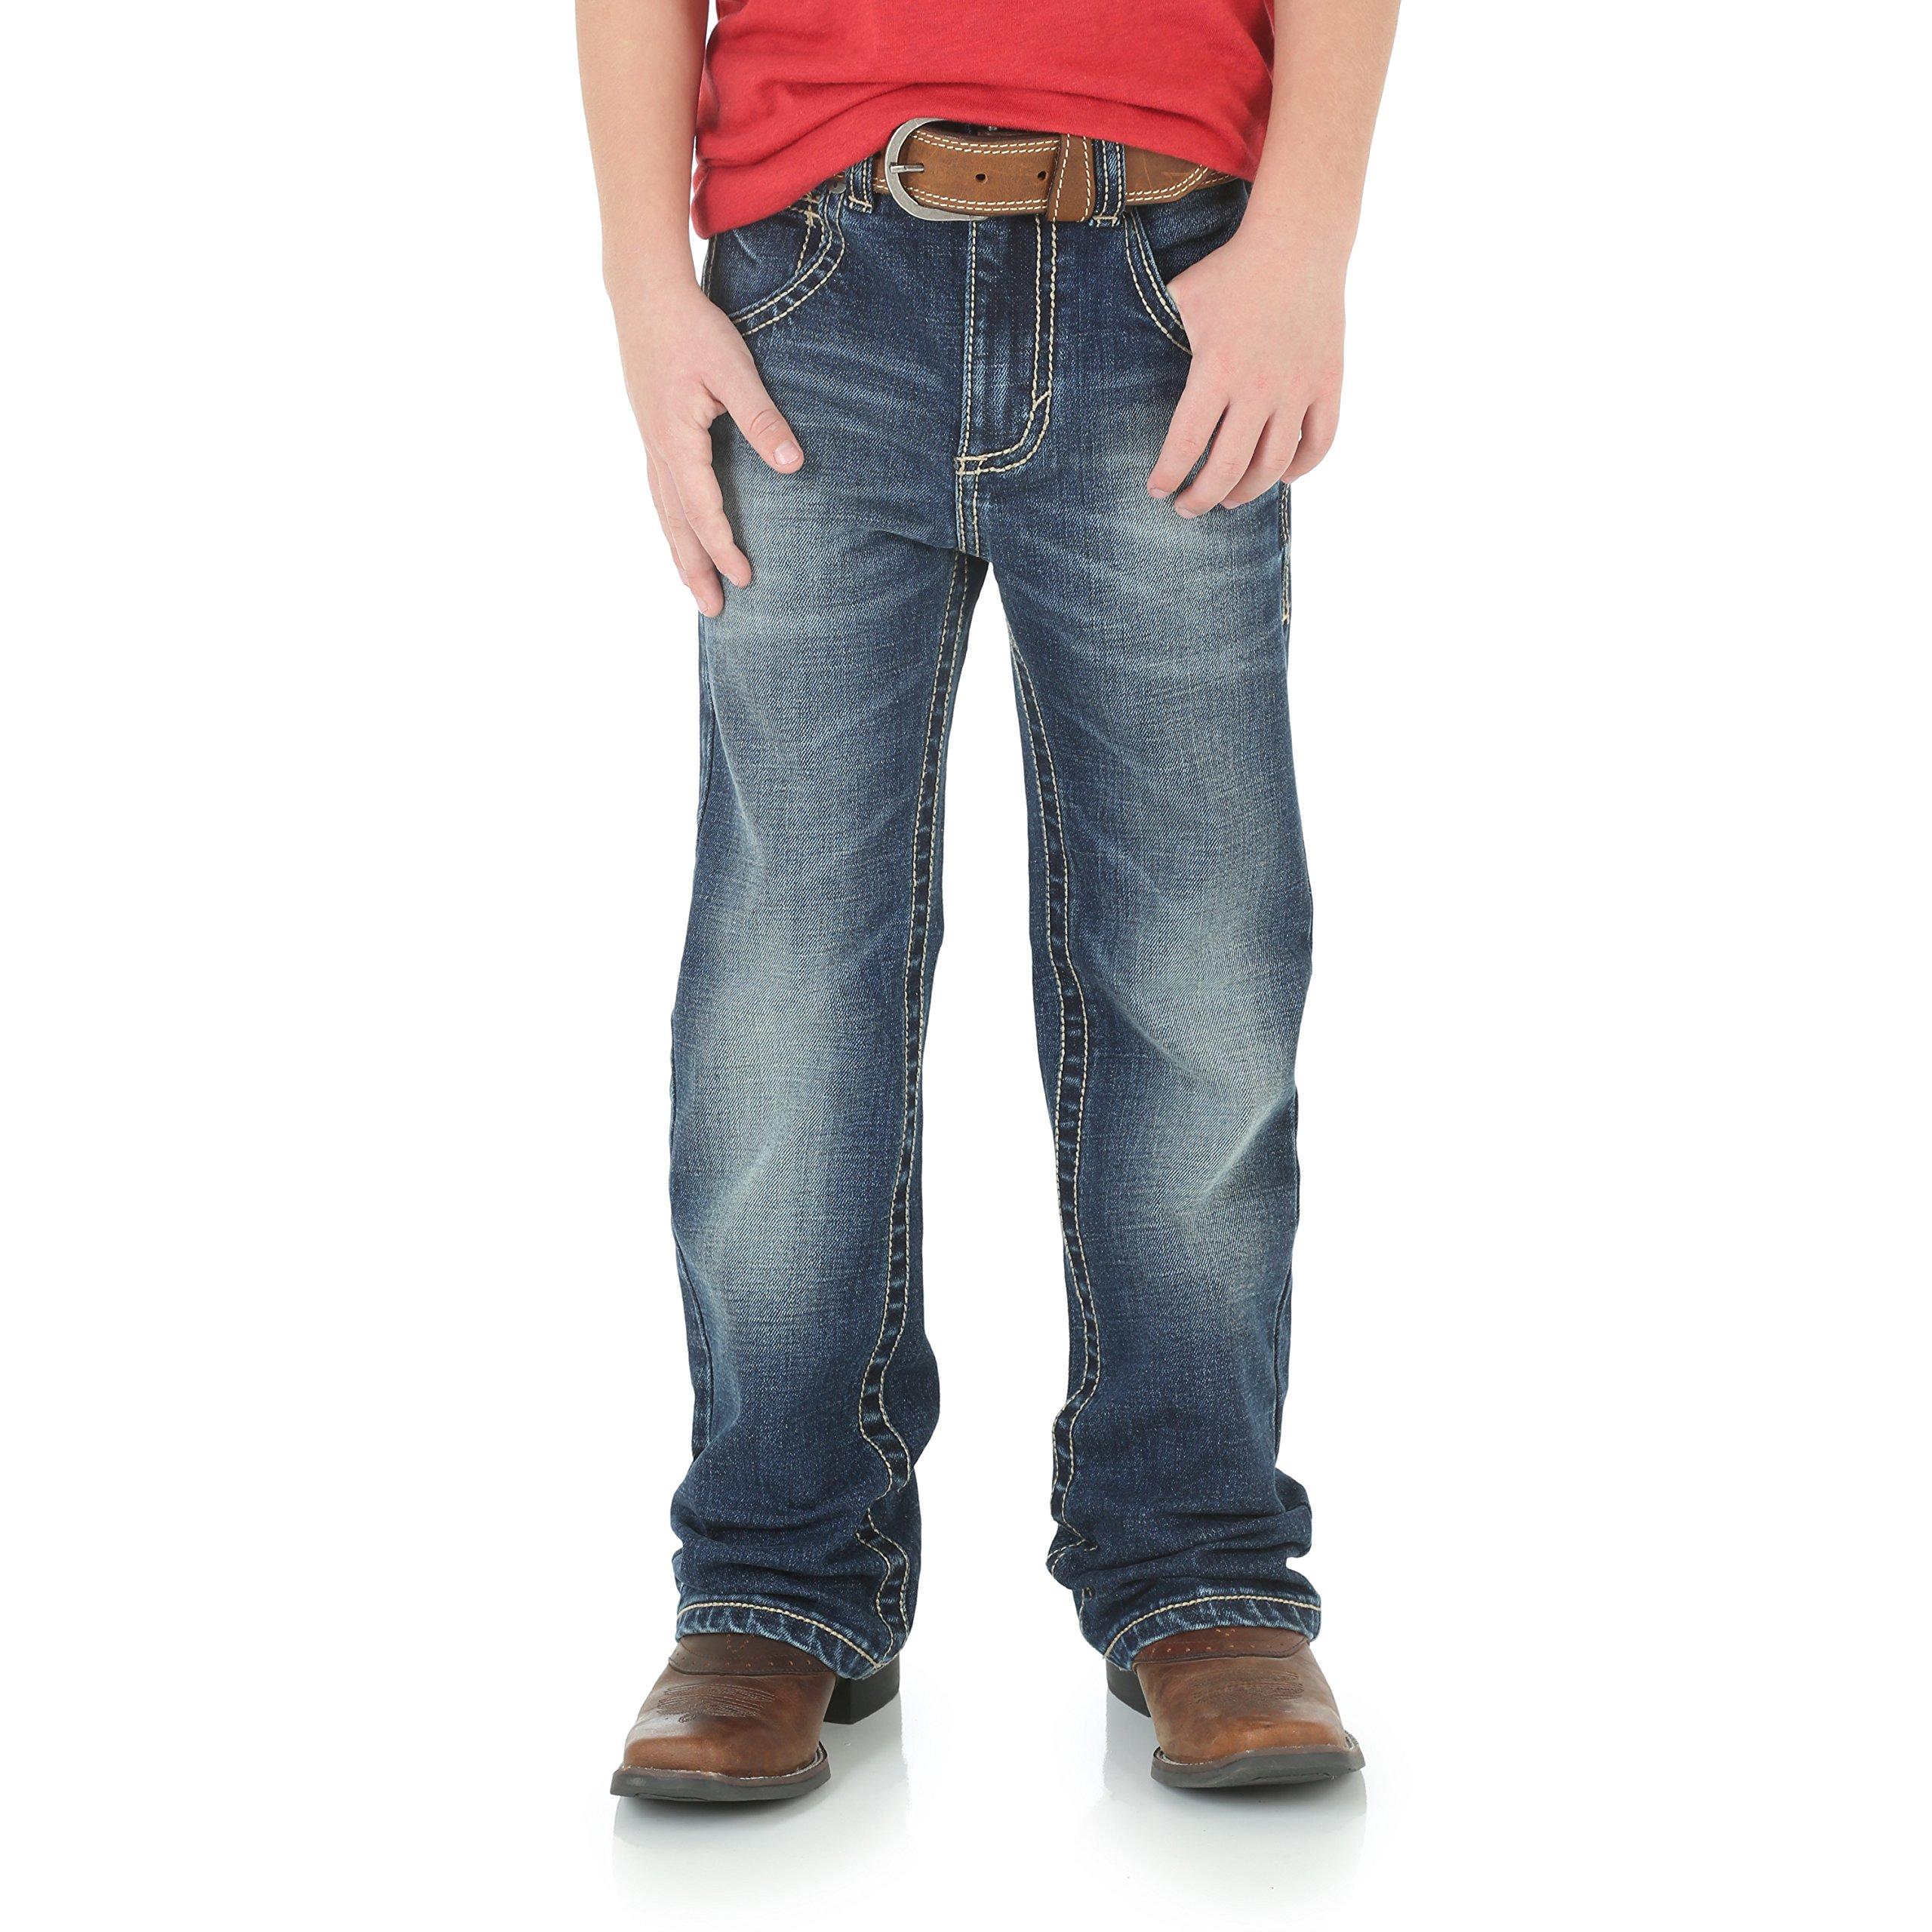 Wrangler Boys' 20X Vintage Boot Cut Jean, Midland, 7 Reg by Wrangler